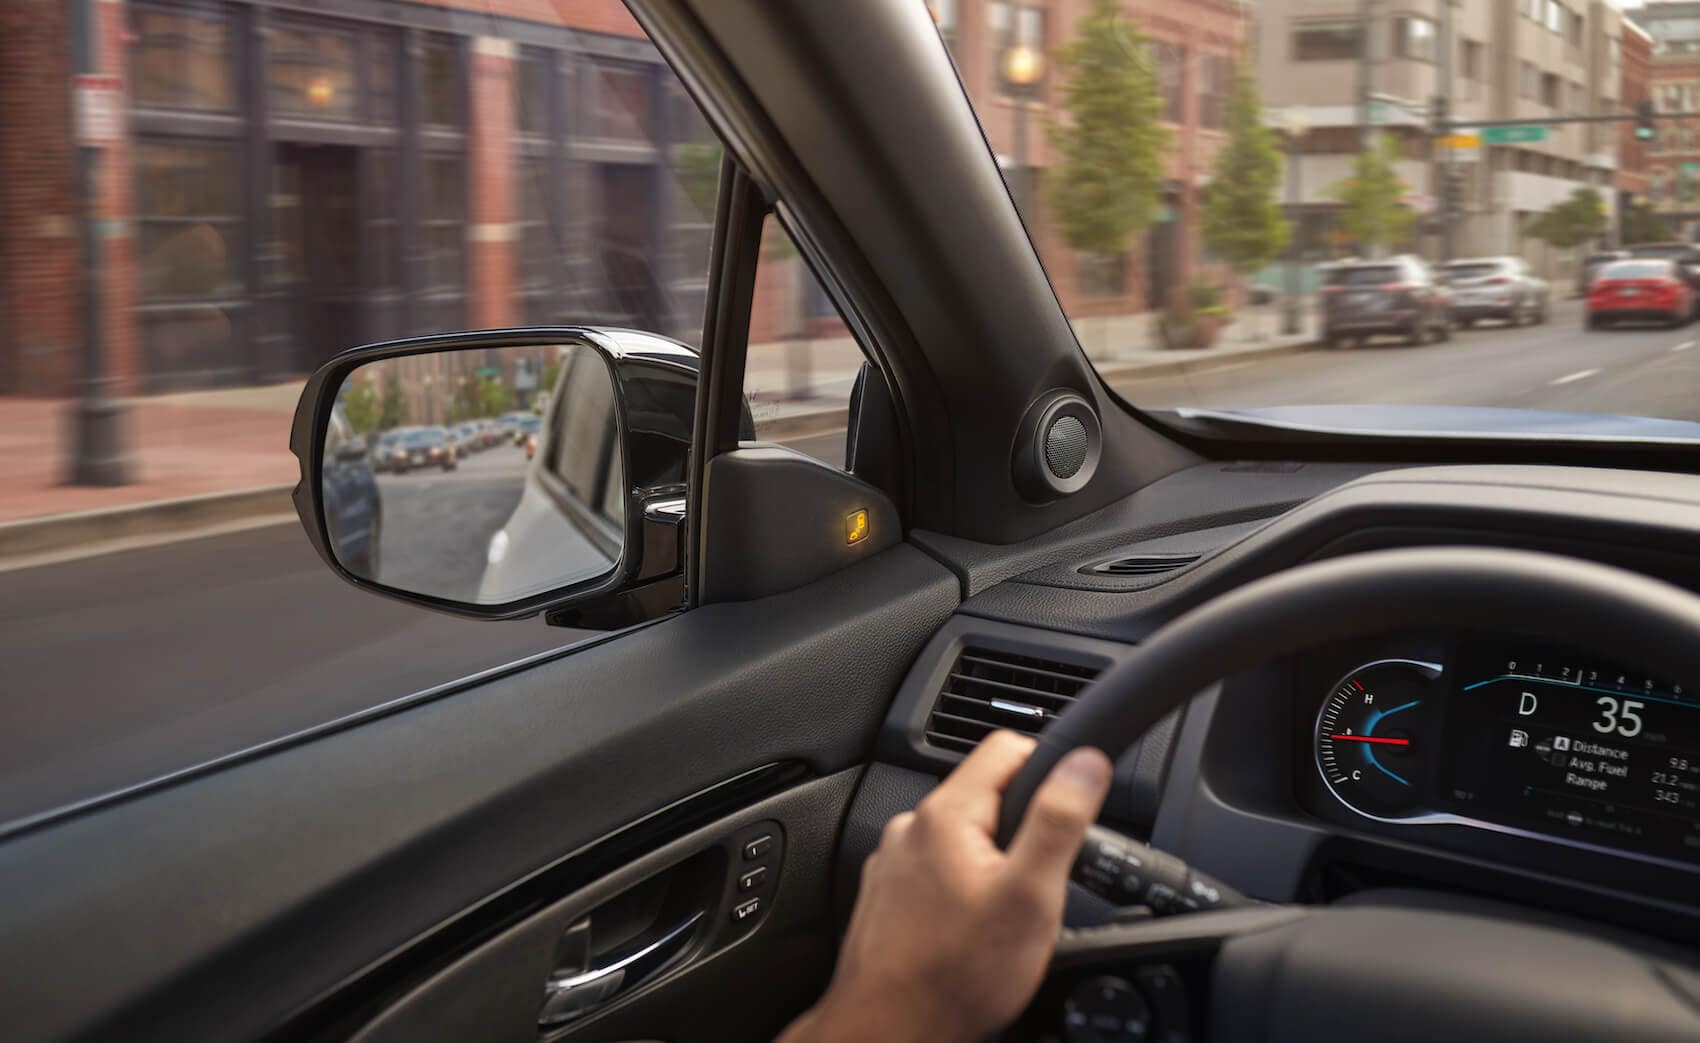 Behind the wheel of a 2020 Honda Passport Abington, PA